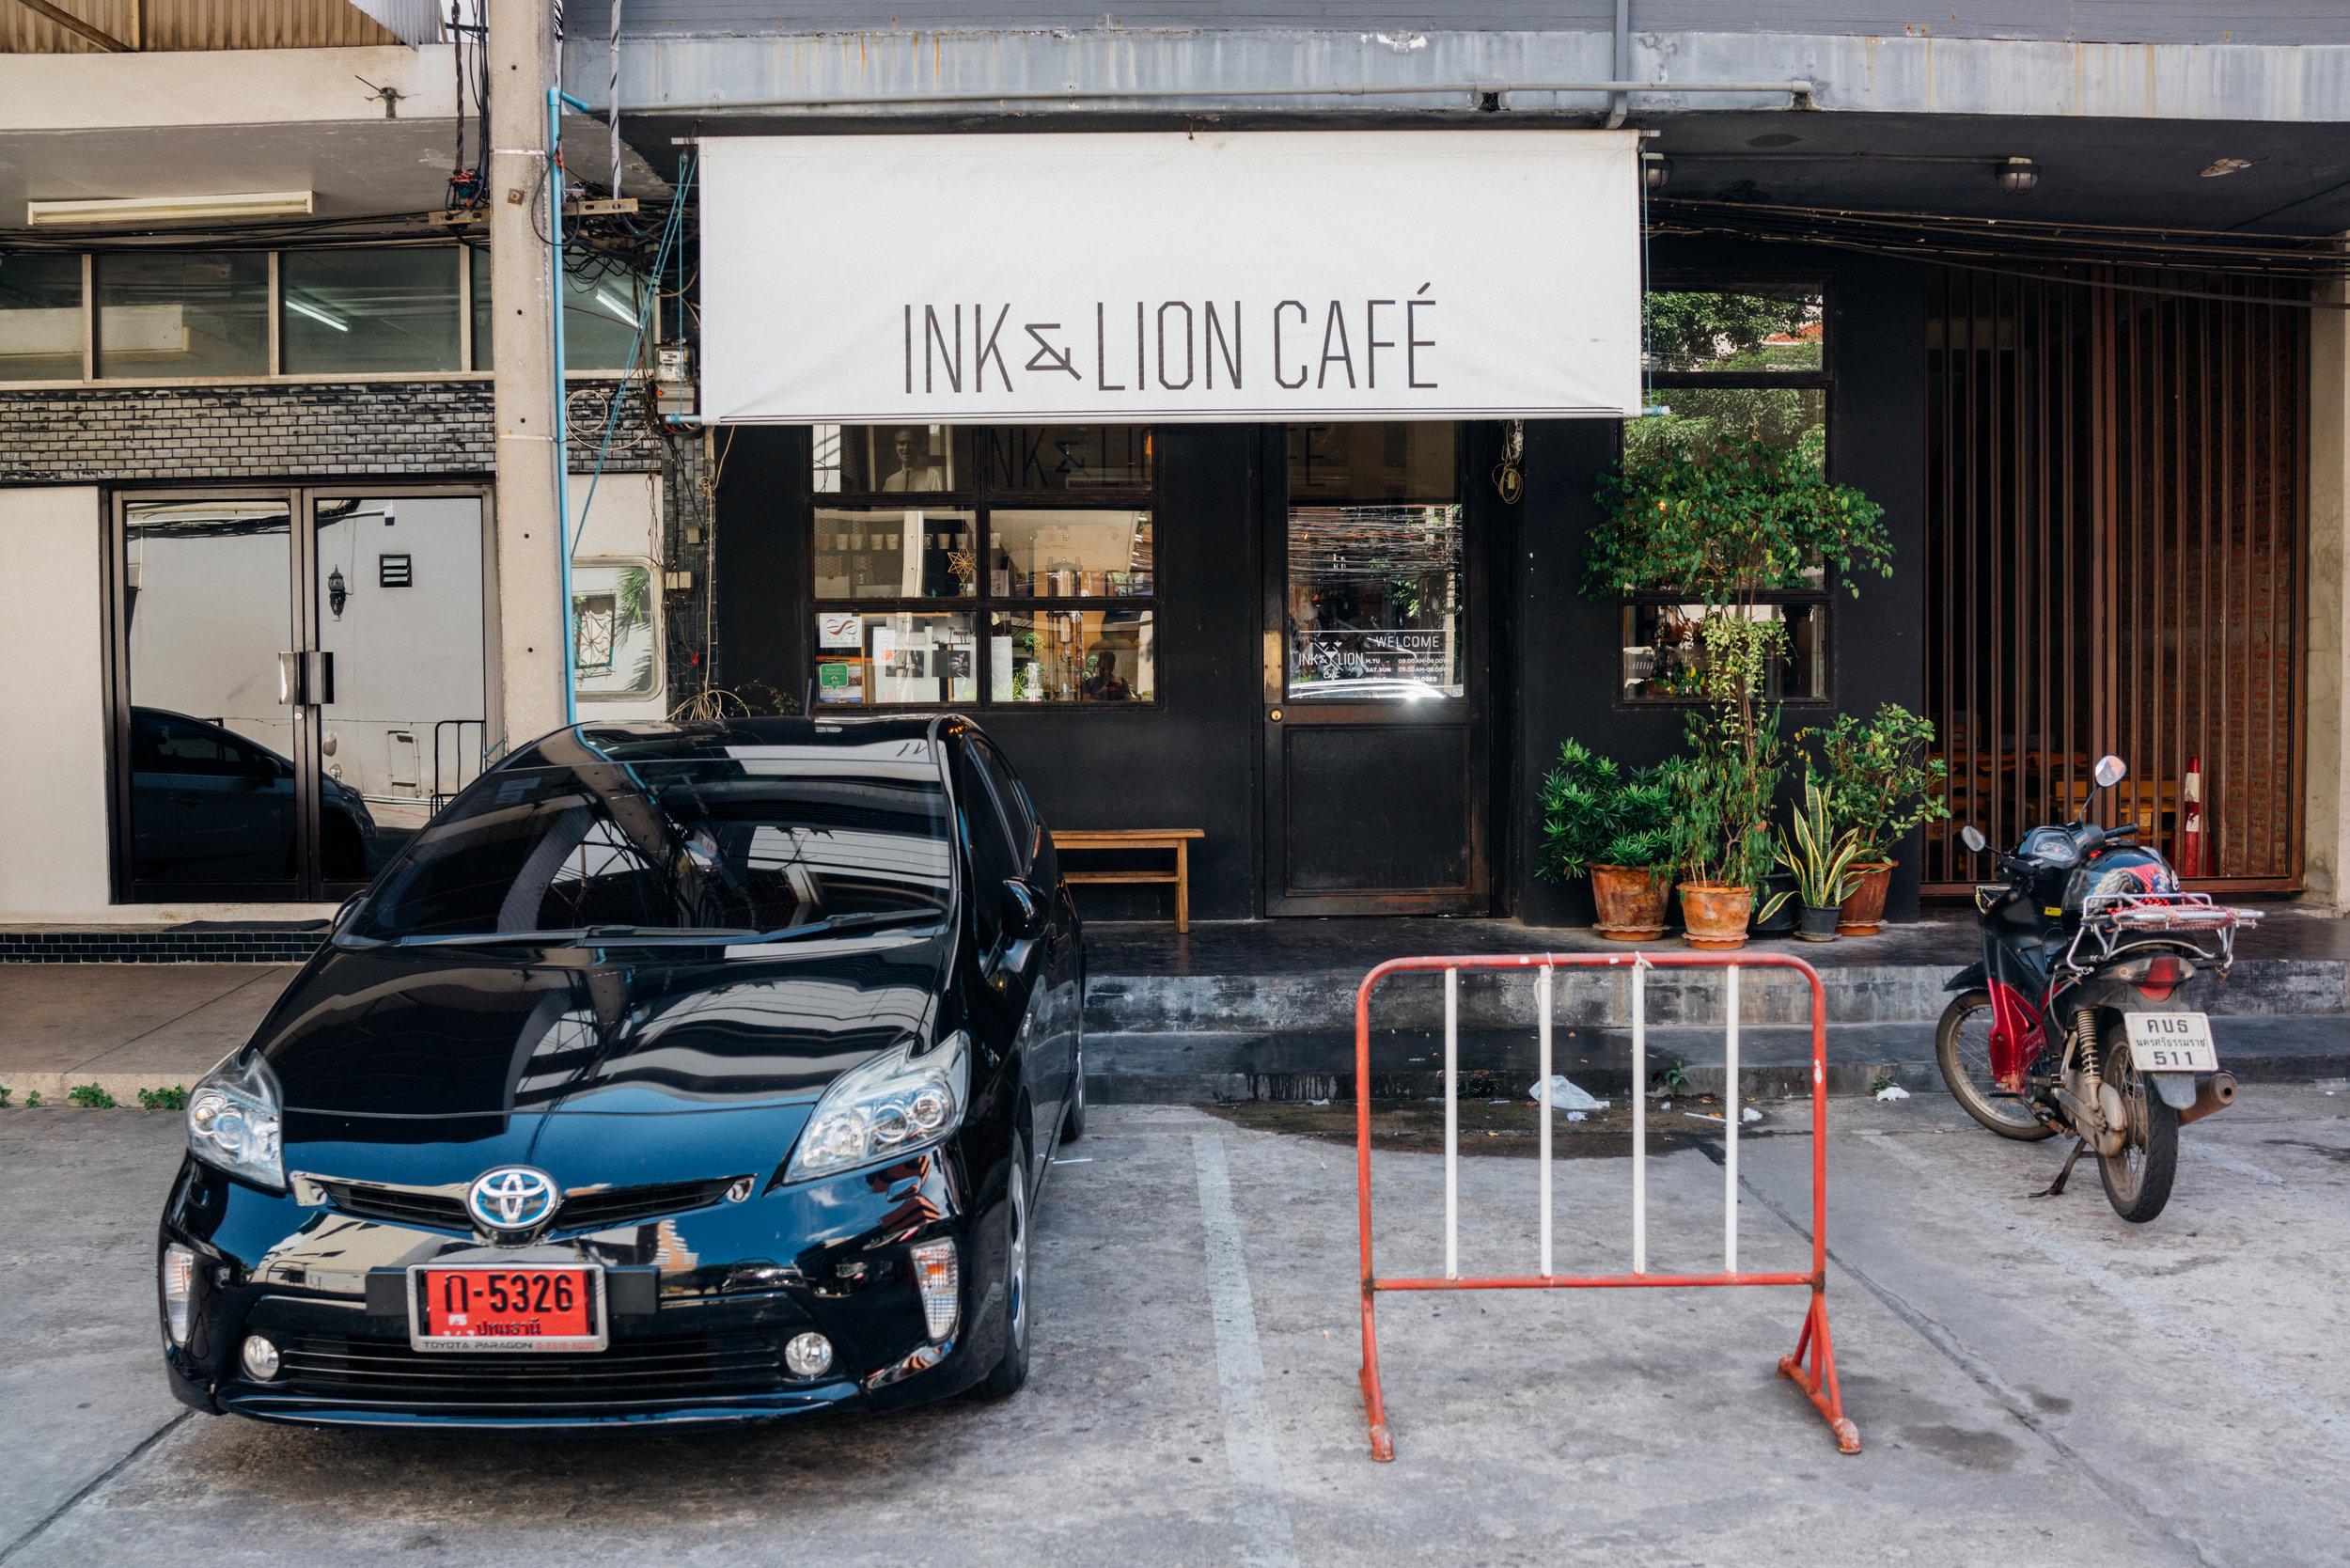 Ink & Lion exterior, in Bangkok